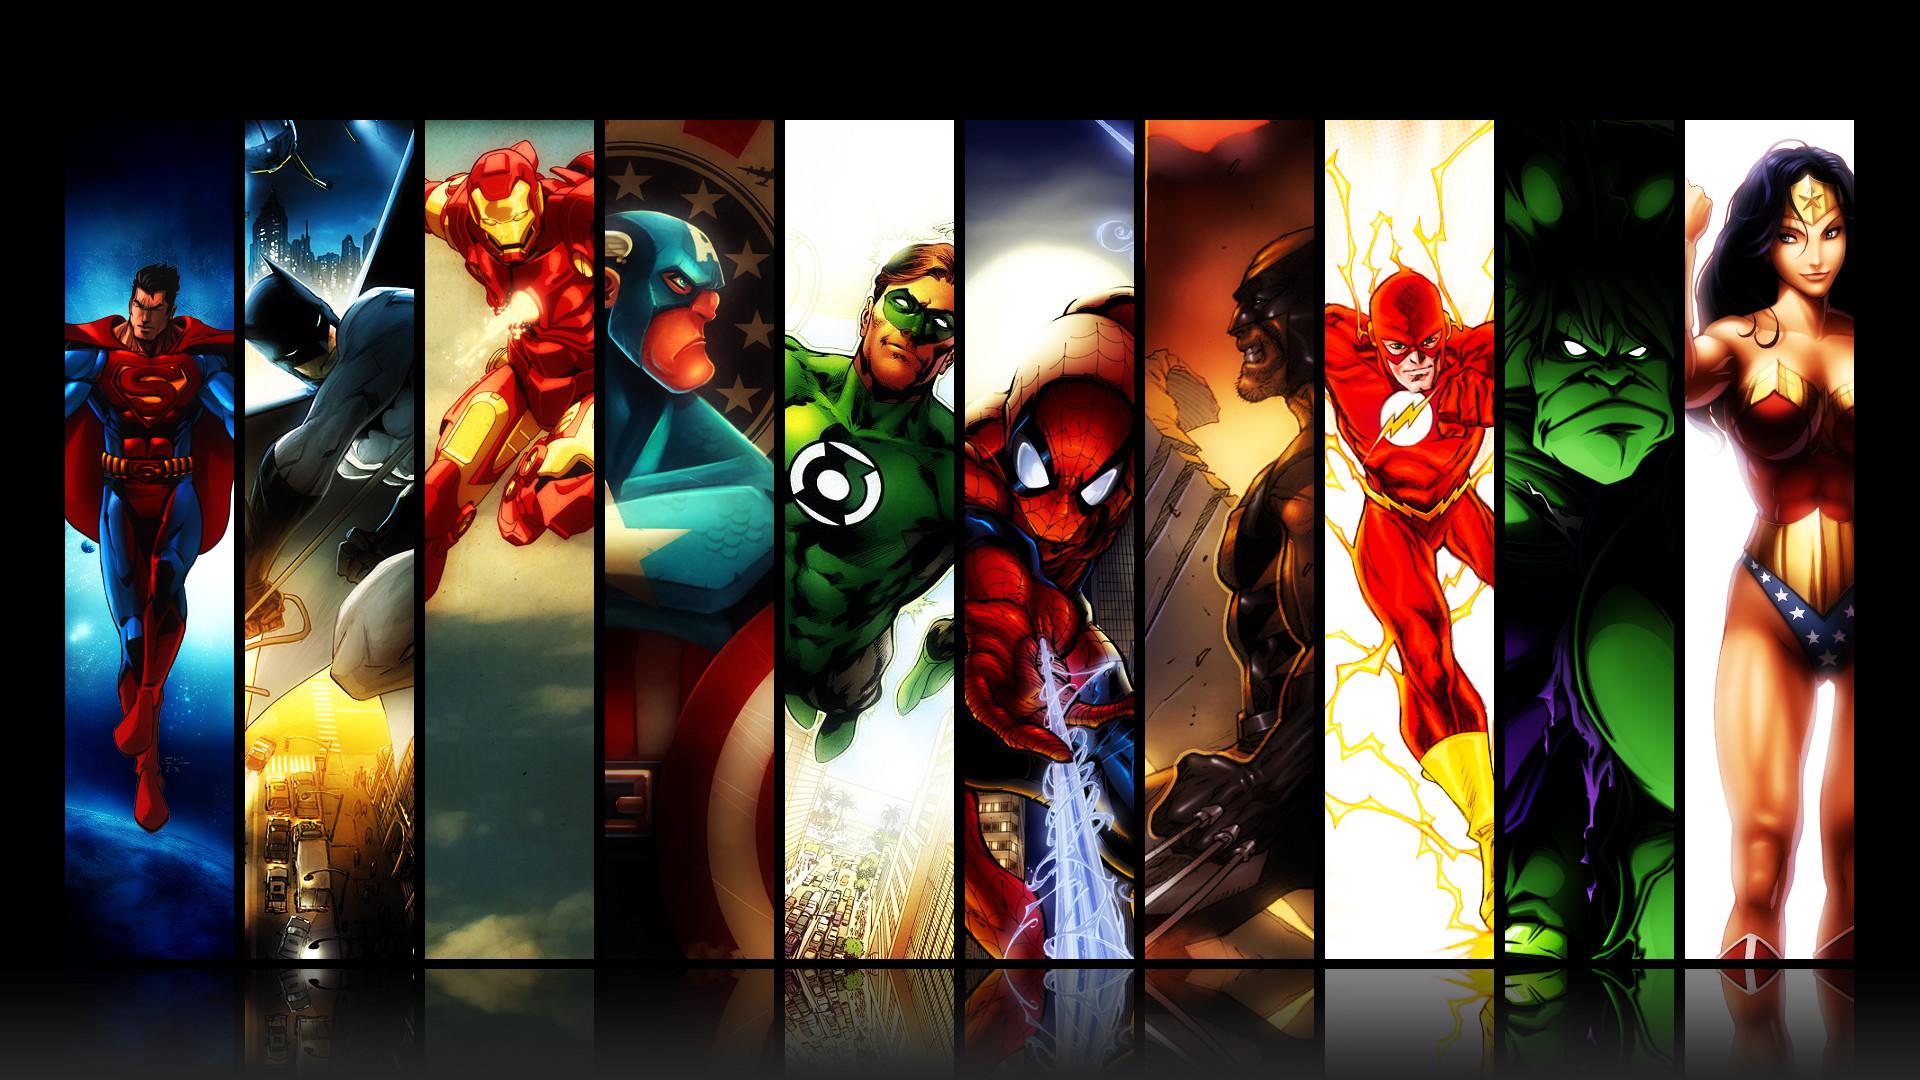 Marvel Heroes Comics wallpaper HD. Free desktop background 2016 in .